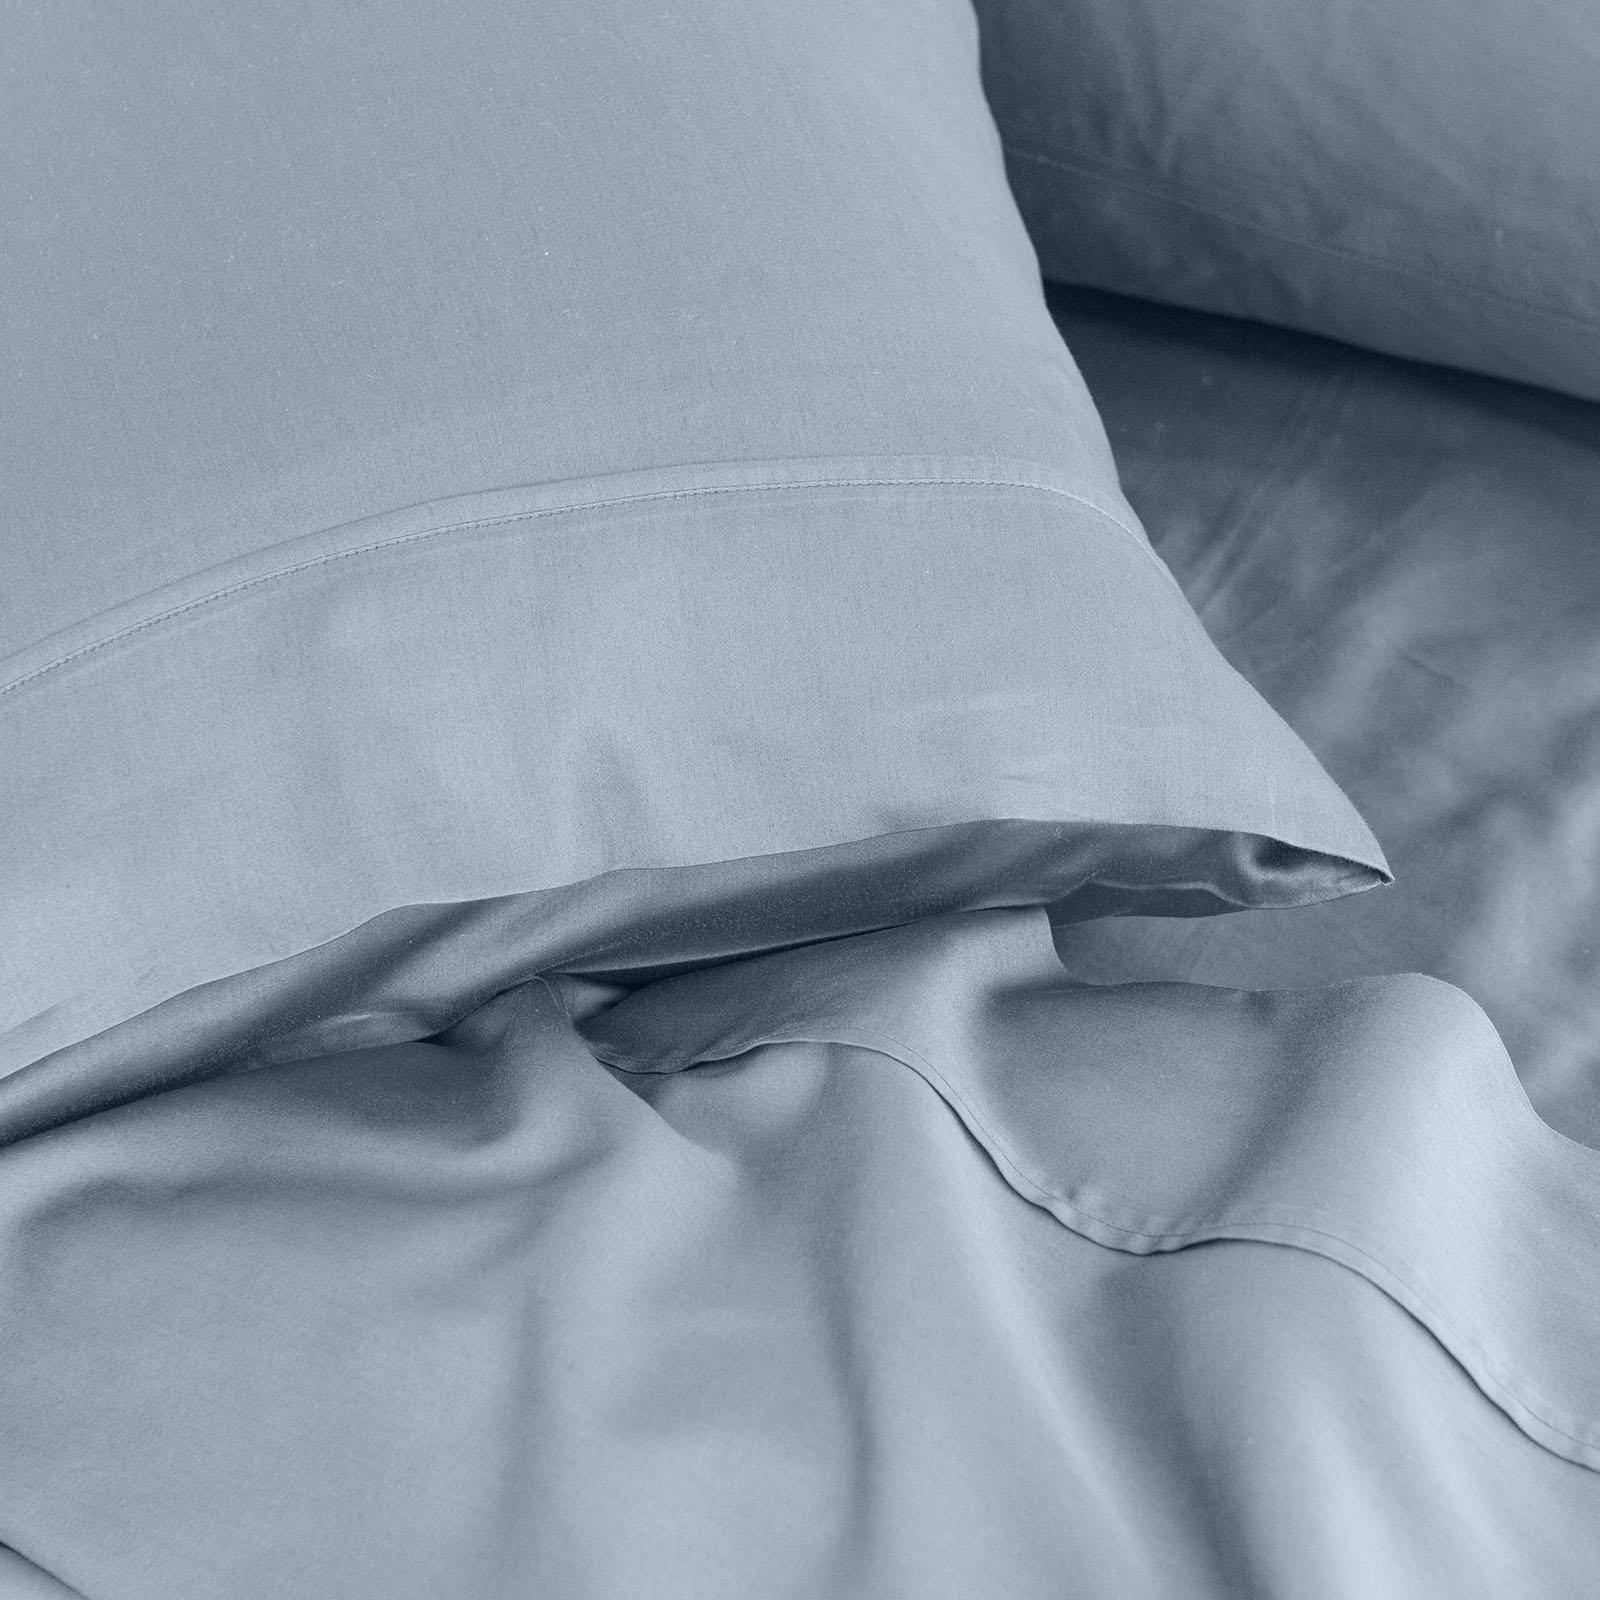 thumbnail 15 - Royal Comfort 1000TC Hotel Grade Bamboo Cotton Sheets Pillowcases Set Ultrasoft